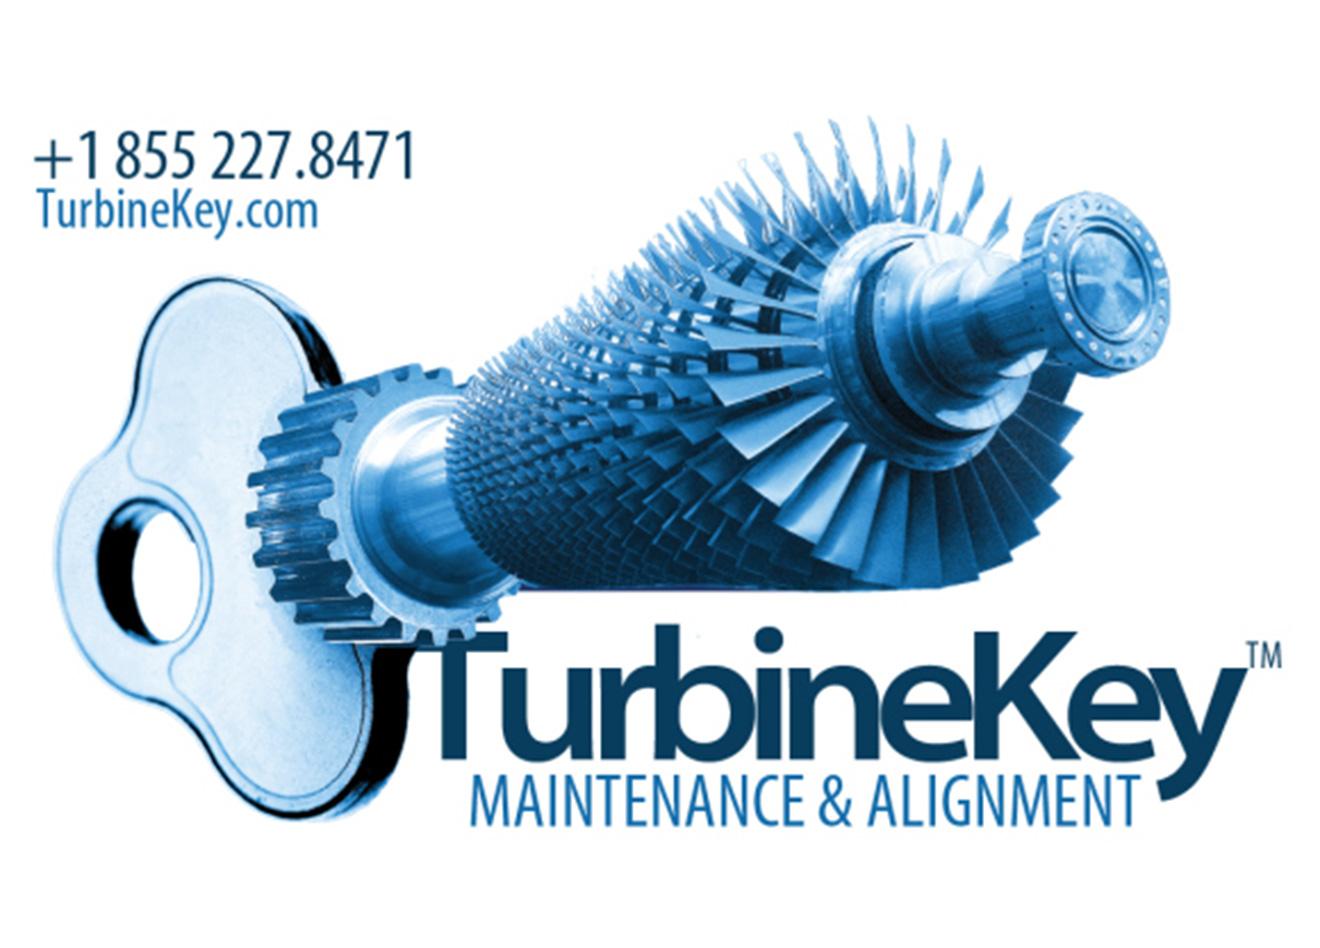 The TurbineKey Solution